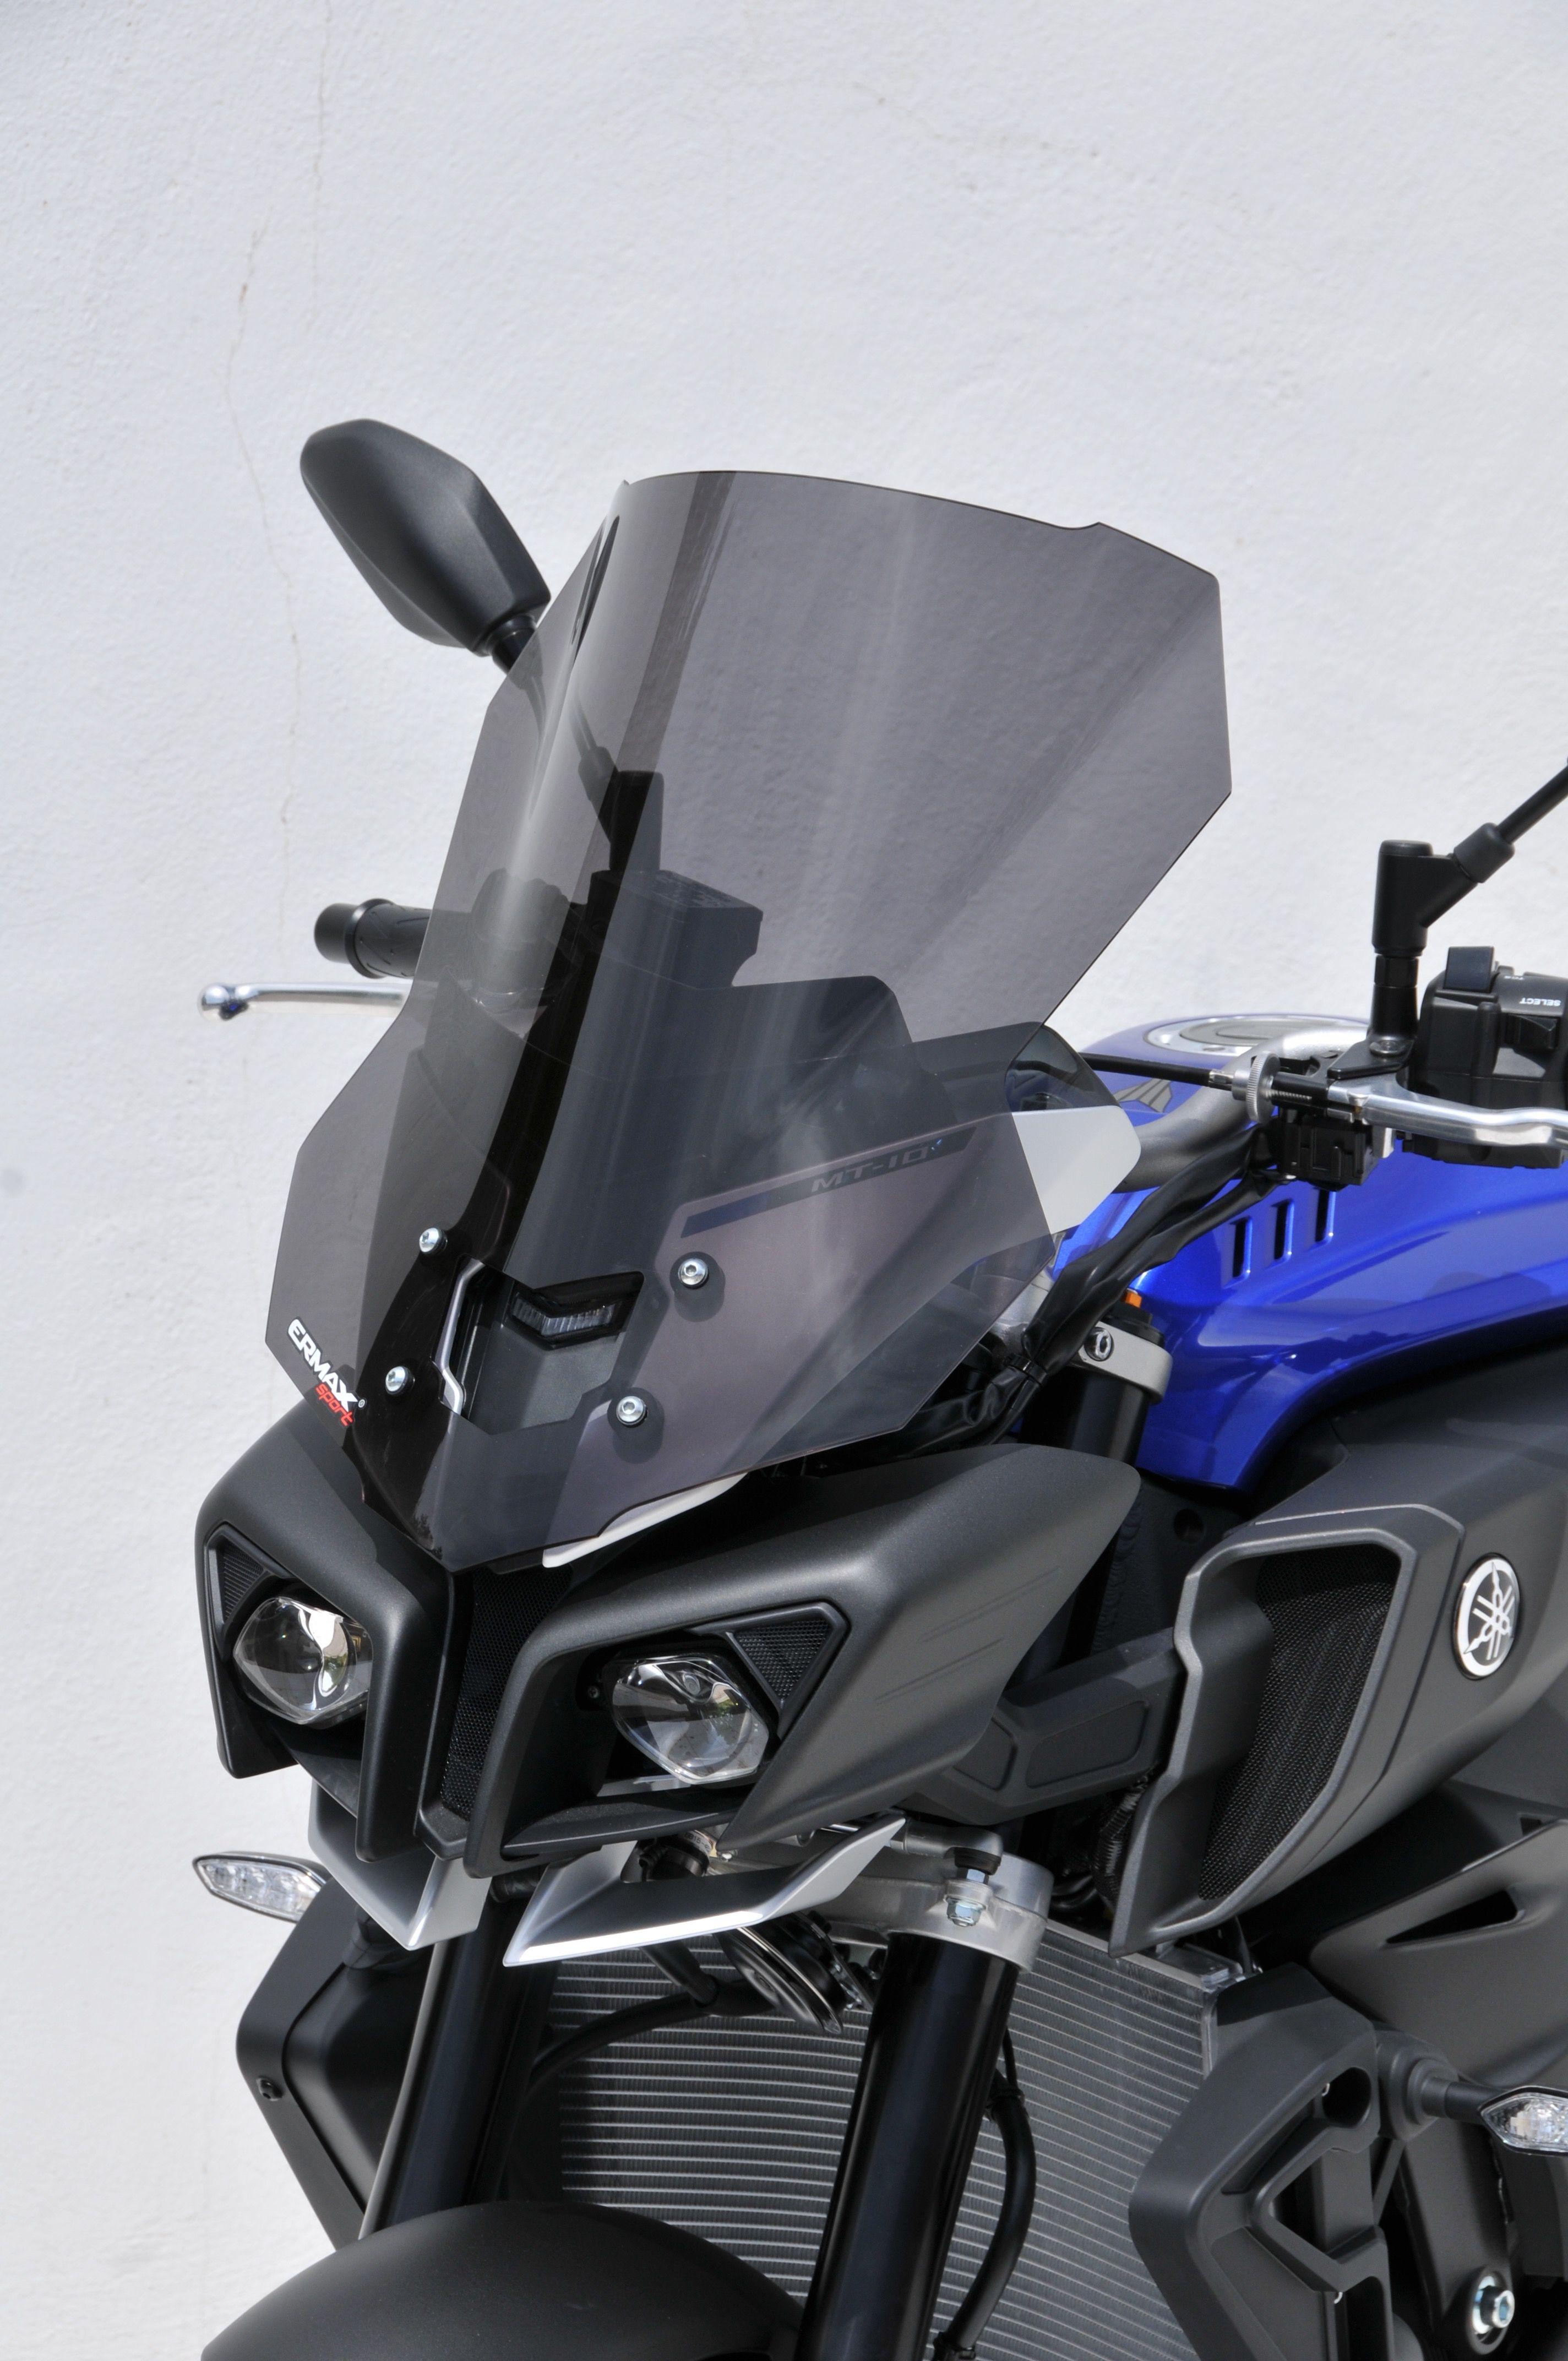 Tête De Fourche Ermax Nuts N Bolts Yamaha Fz Yamaha Bike